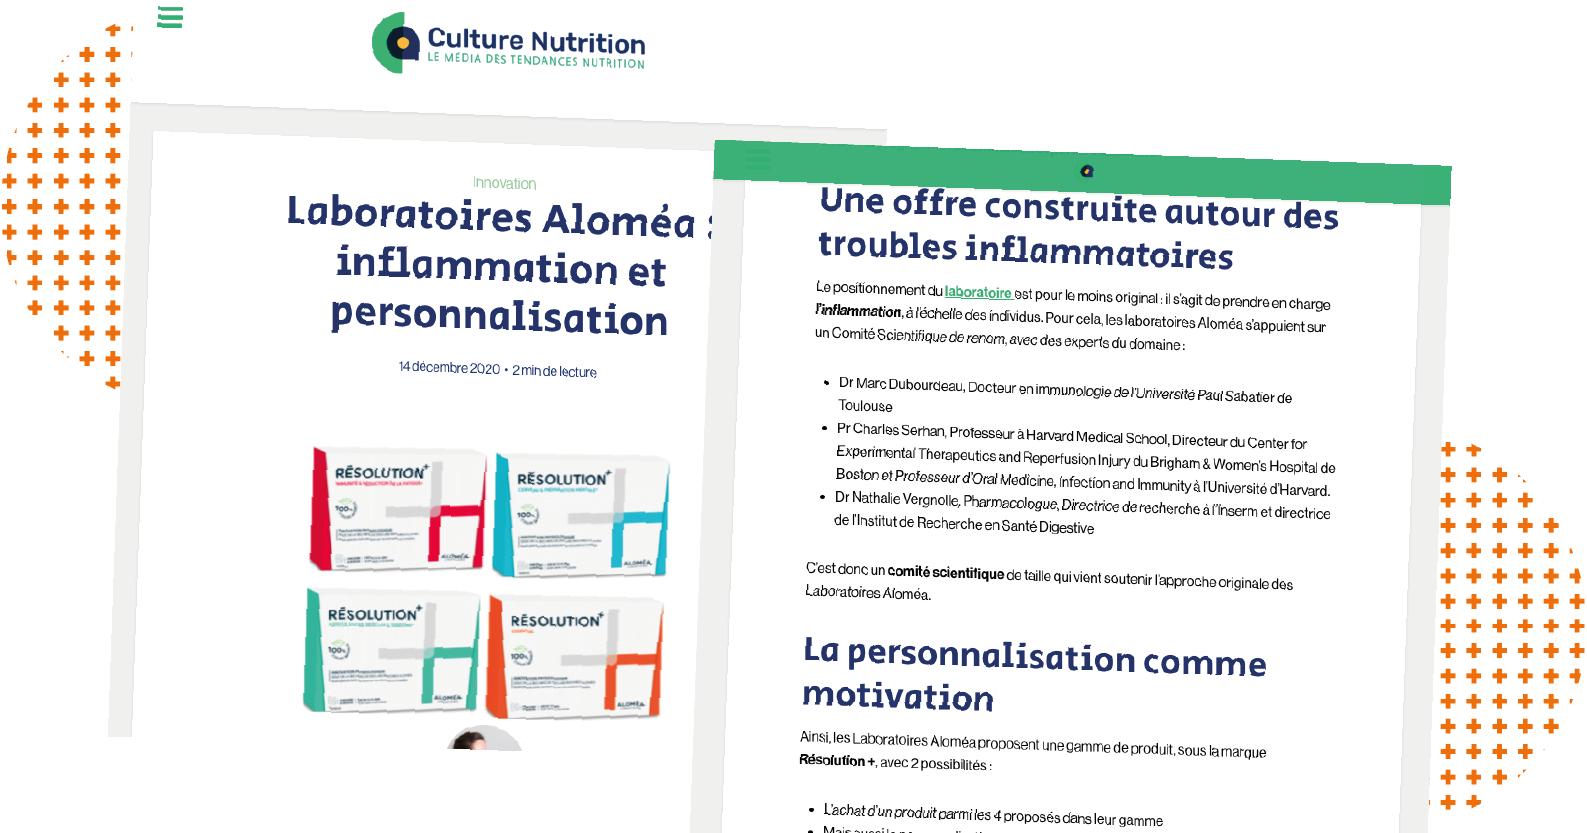 Culture Nutrition